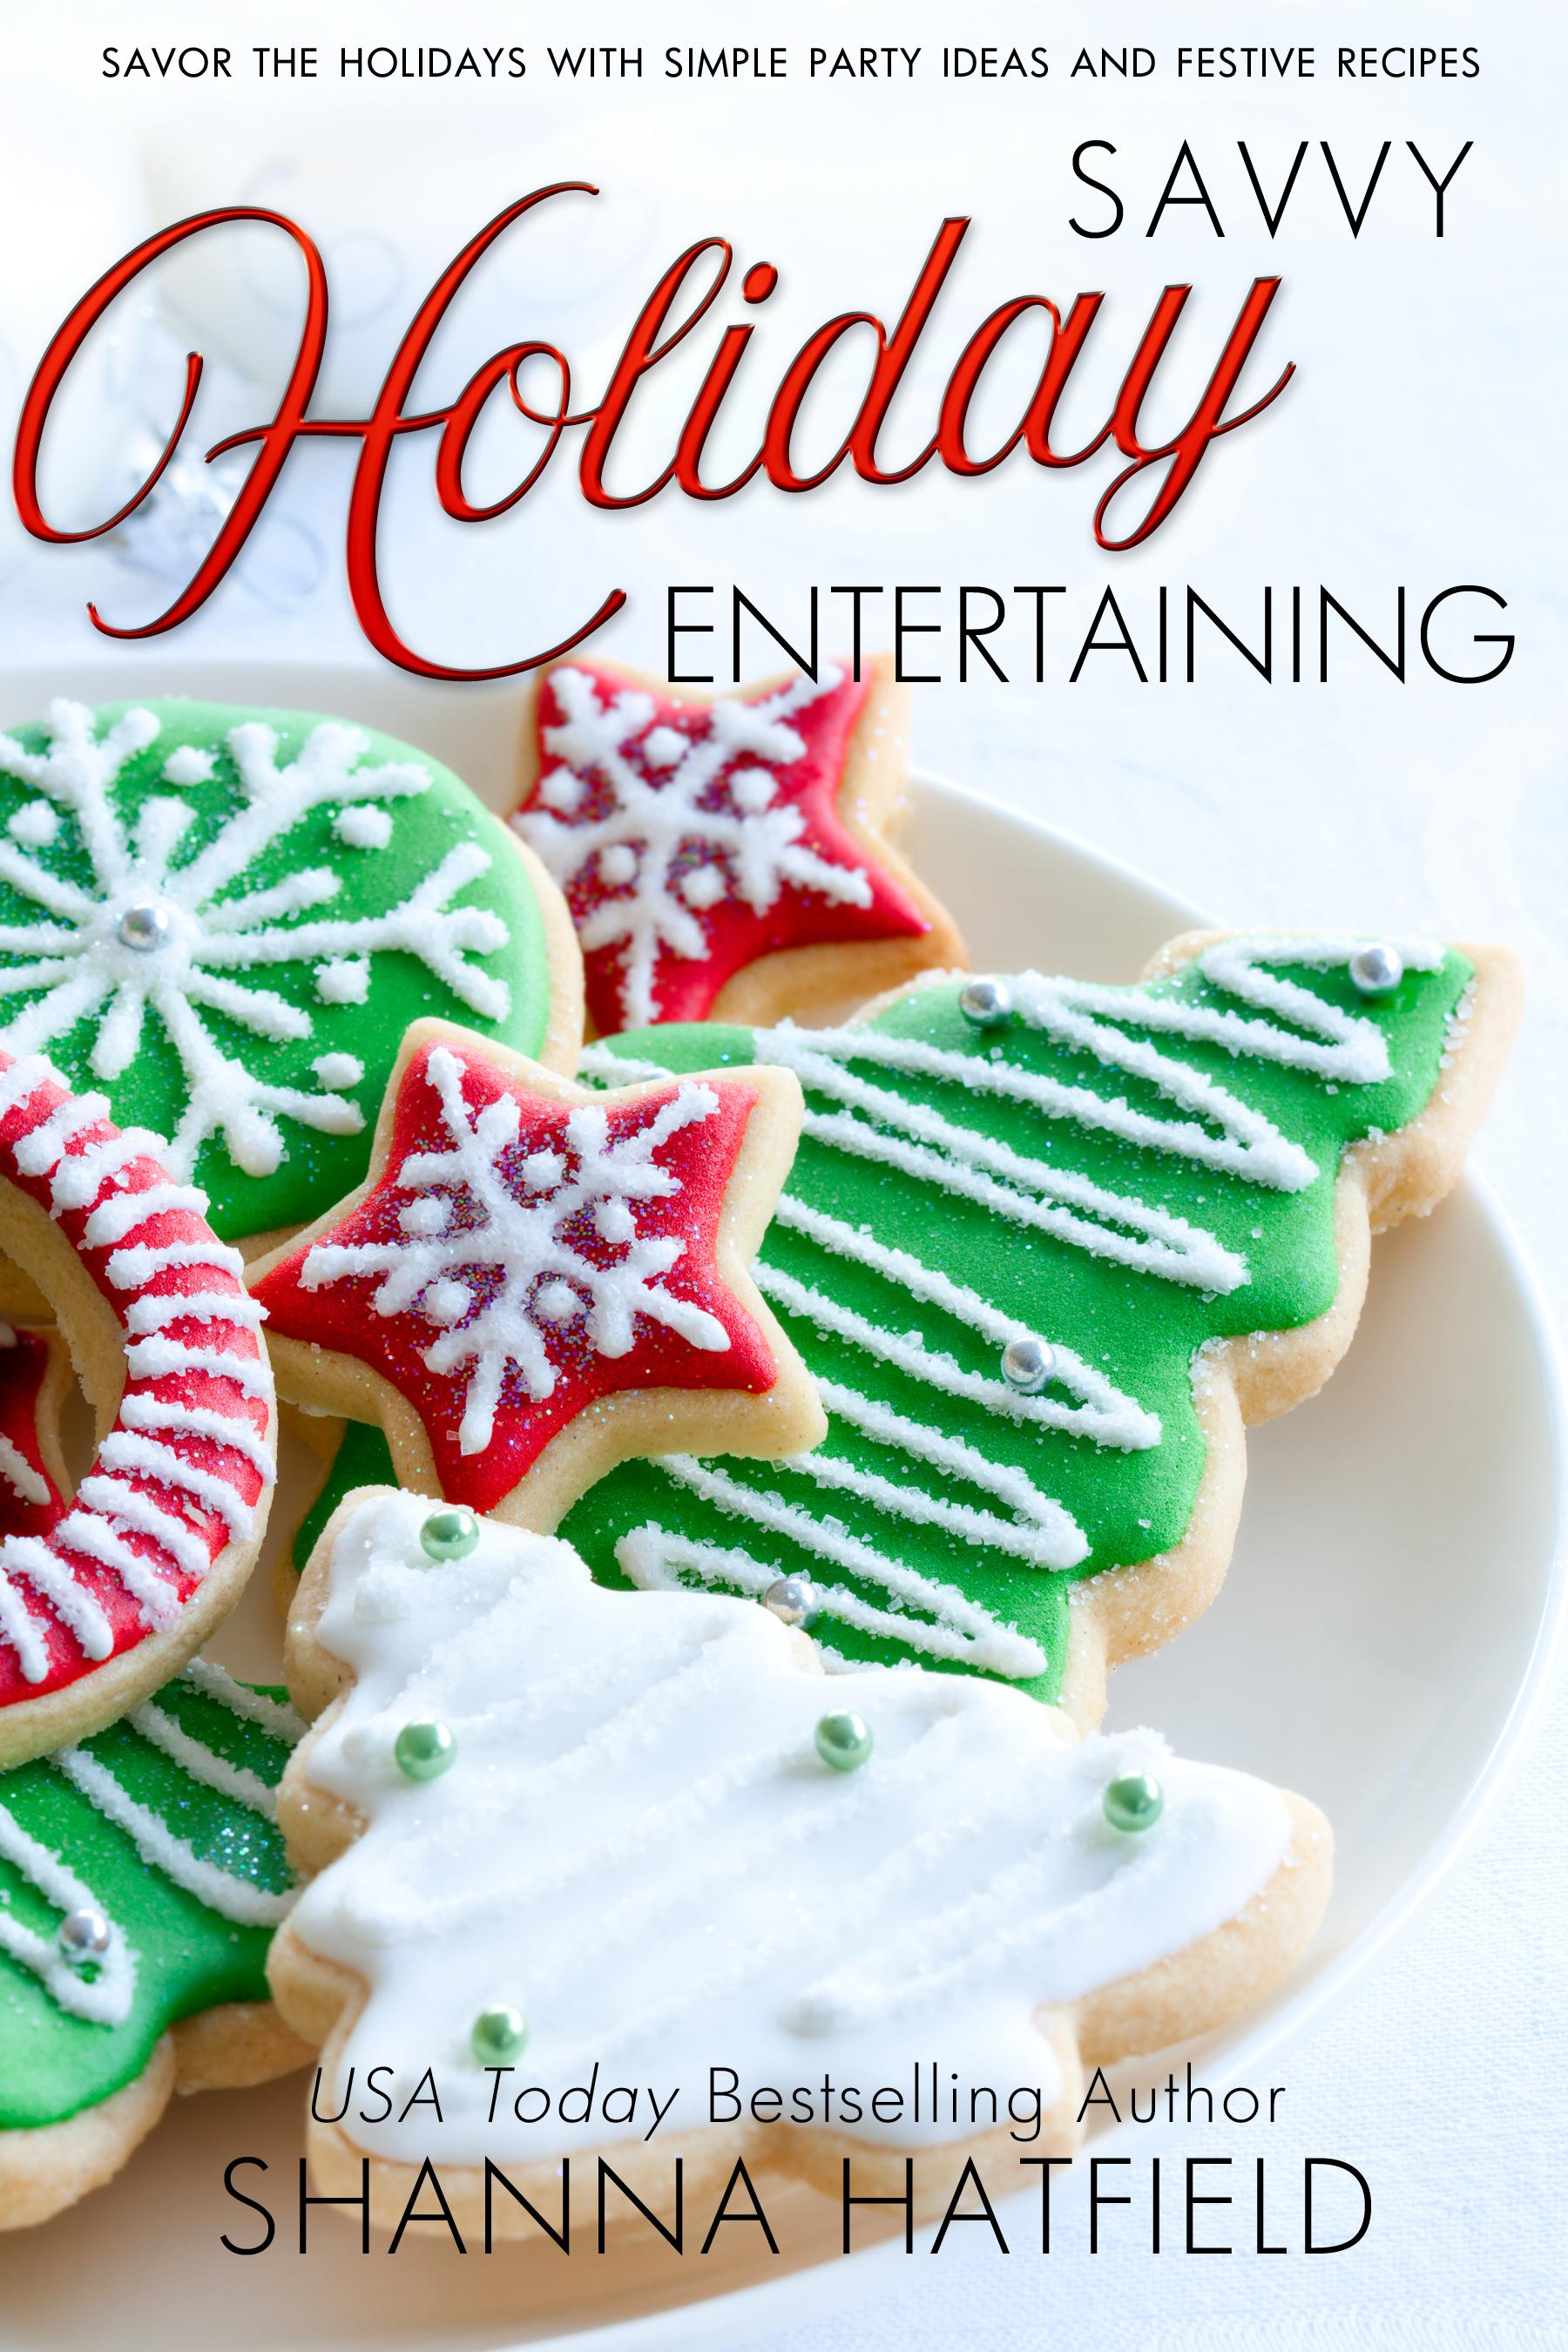 Savvy Holiday Entertaining